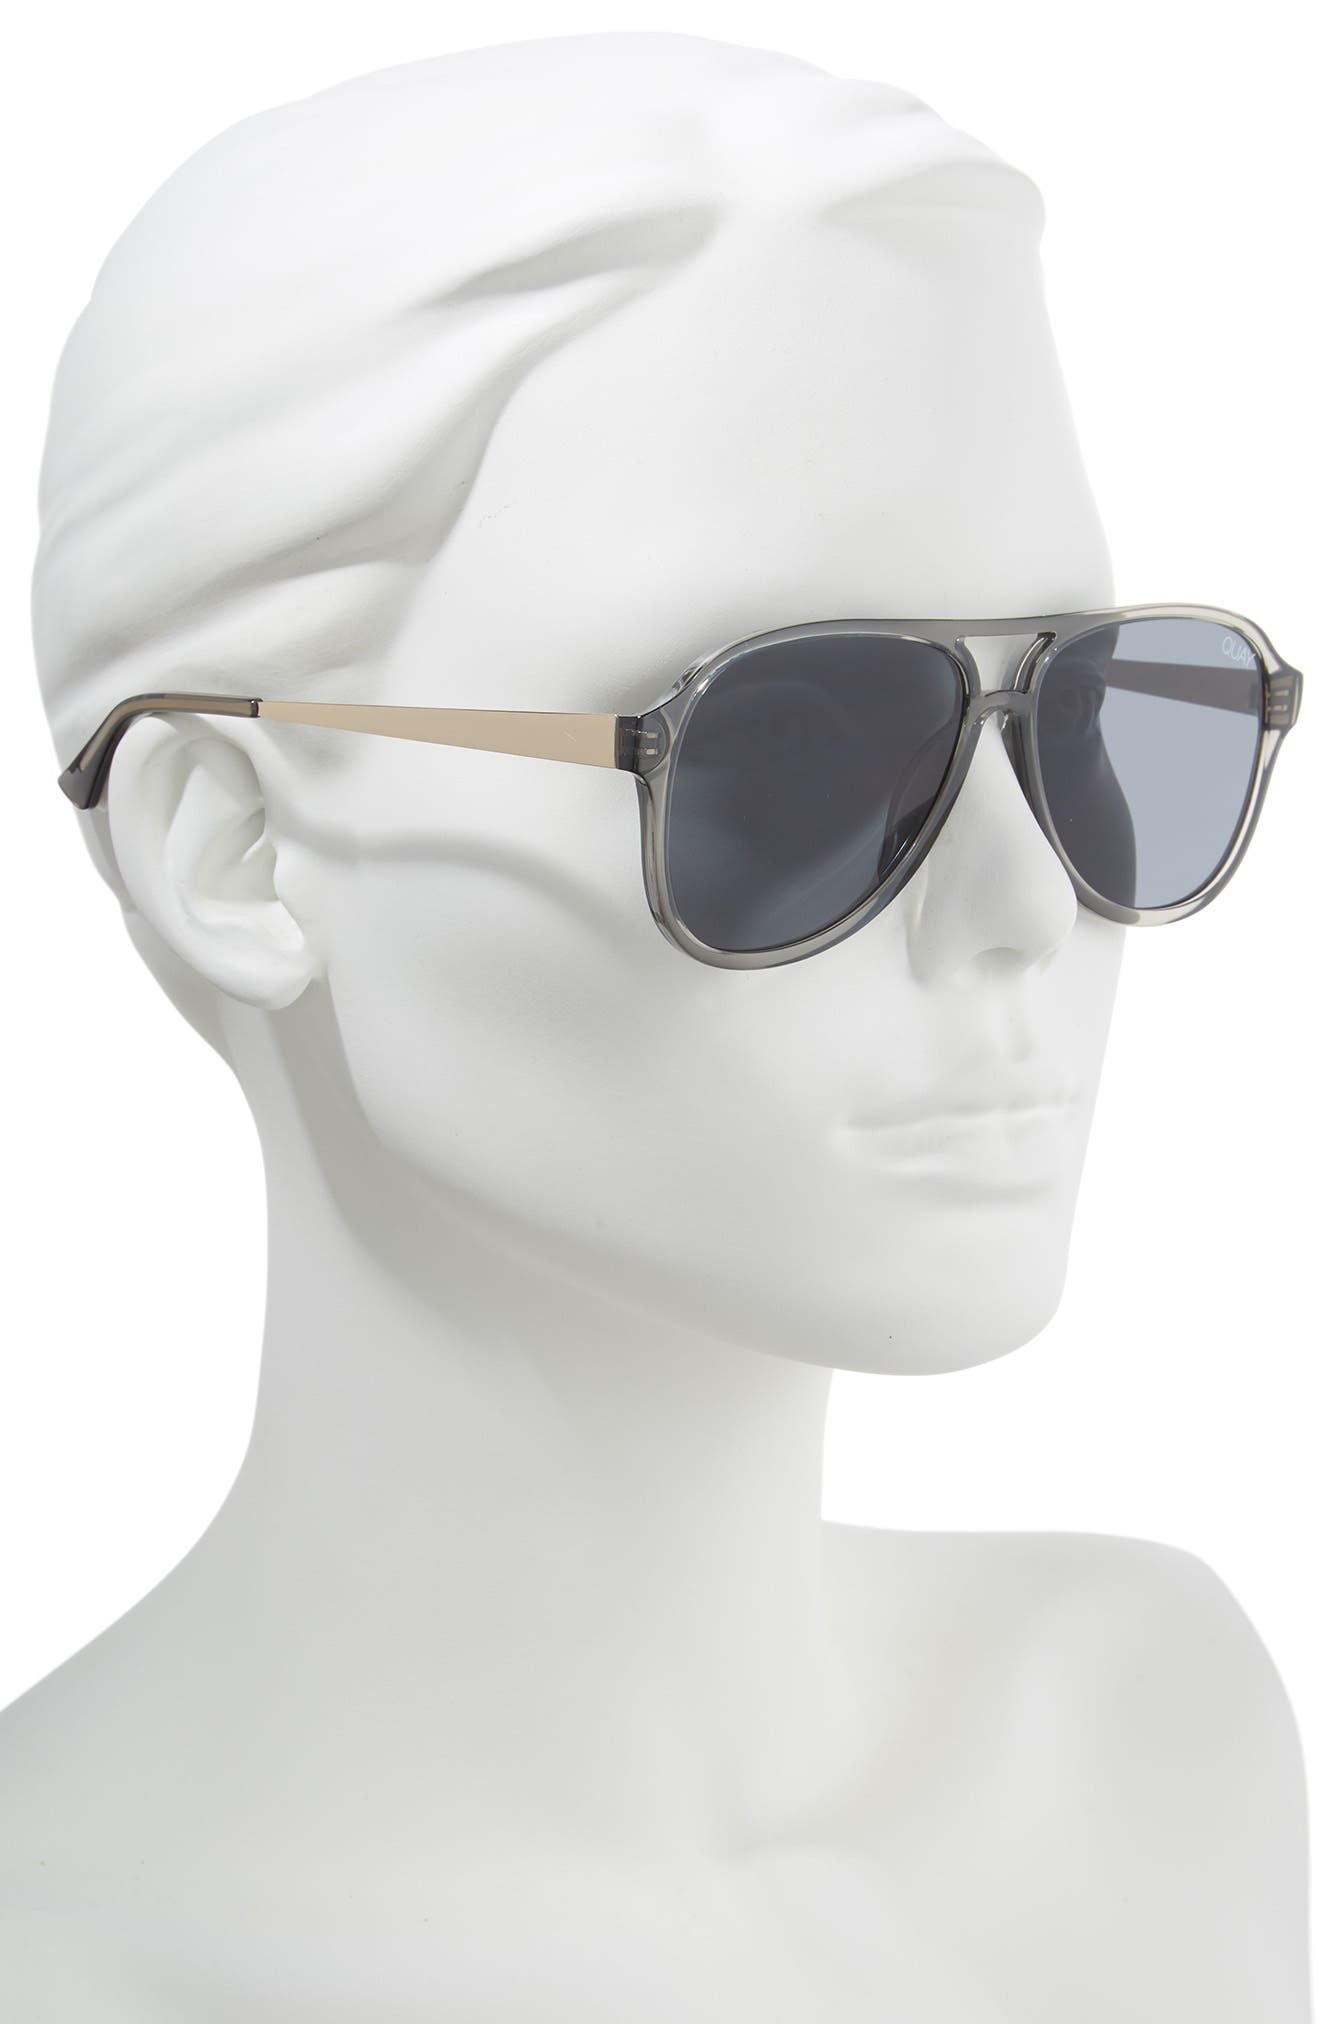 Under Pressure 58mm Aviator Sunglasses,                             Alternate thumbnail 2, color,                             GREY/ SMOKE